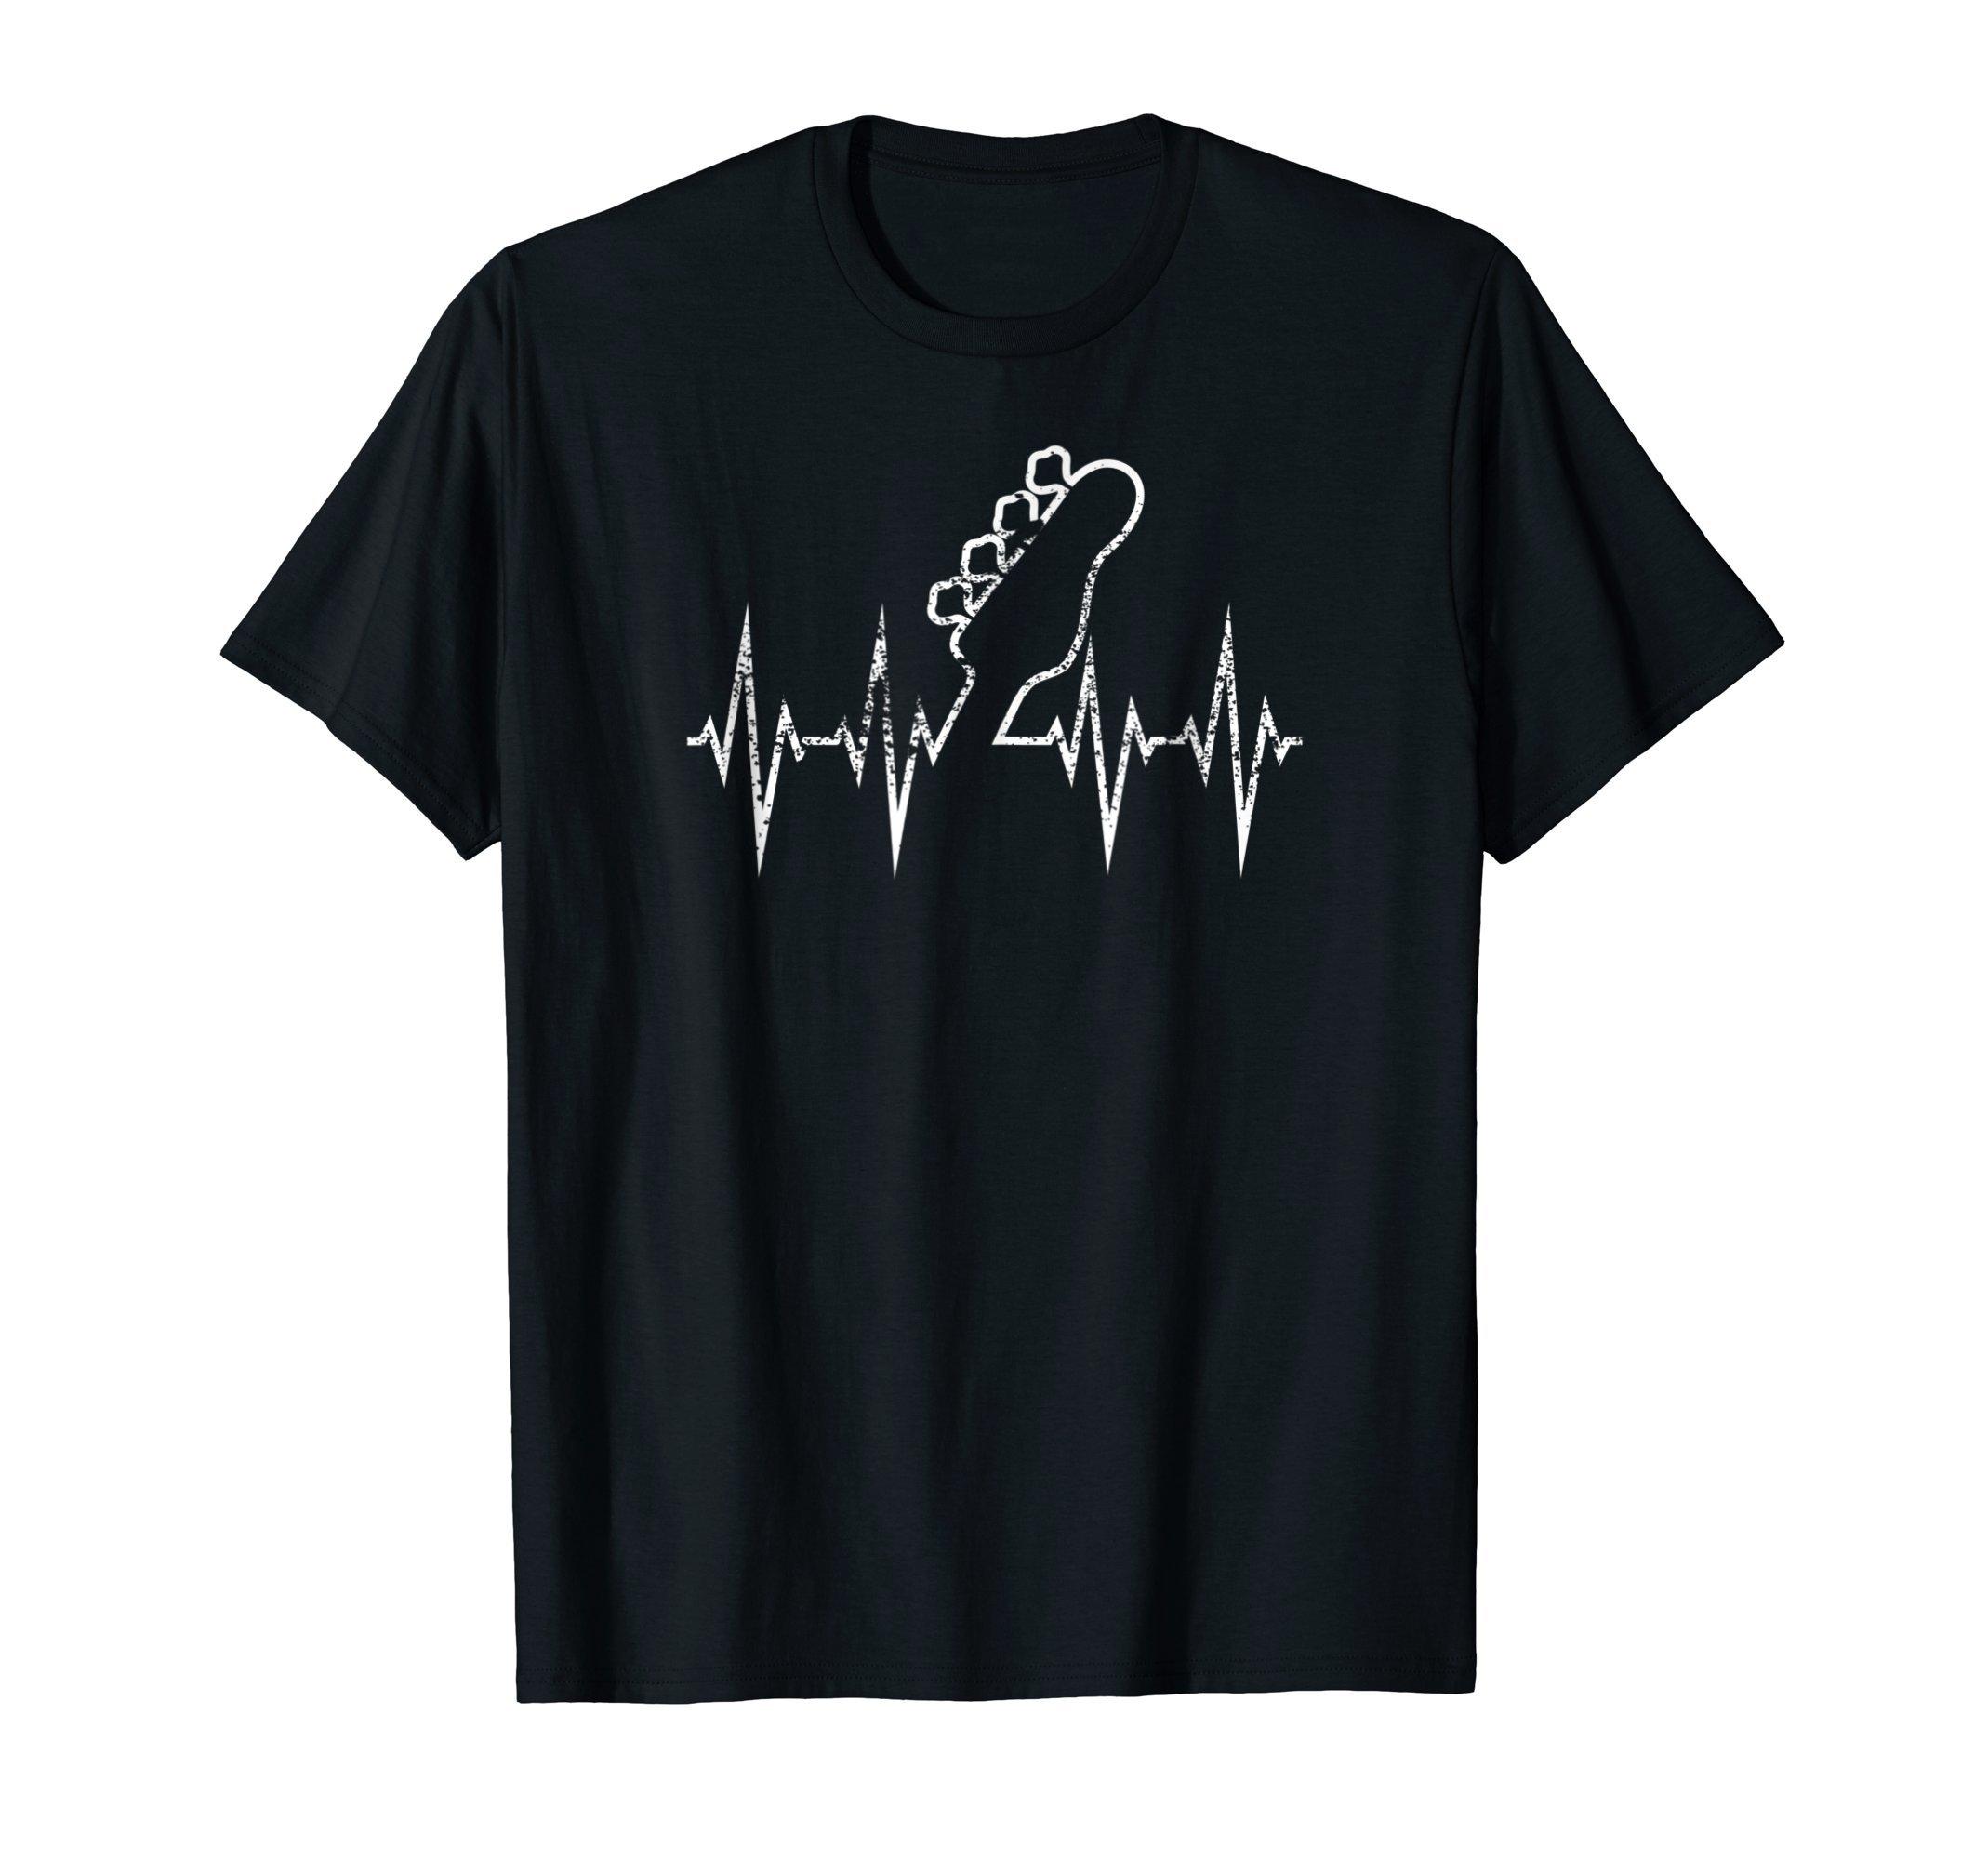 Crazy Heartbeat Electric Bass Guitar Rock Music Gift Shirt